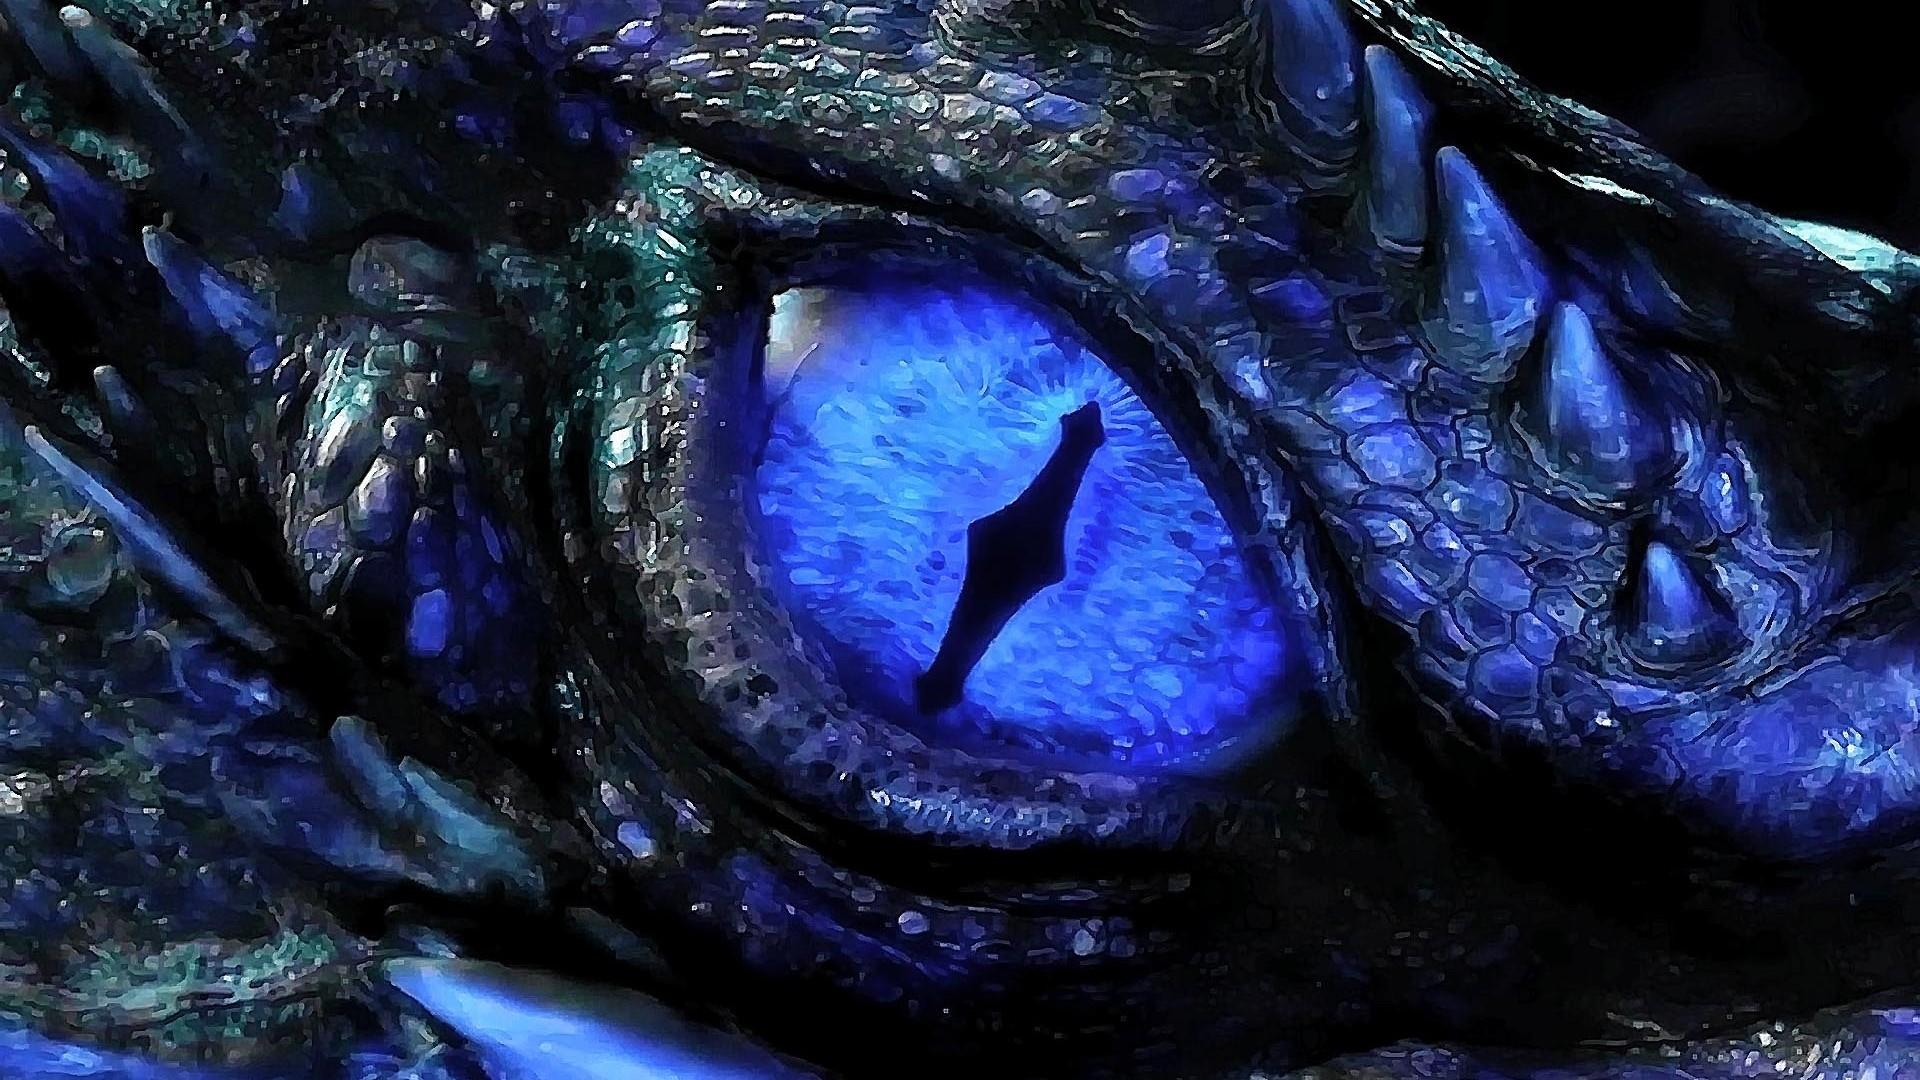 Fantasy Girl Wallpaper 1080p Dragon Eye Wallpaper 62 Images